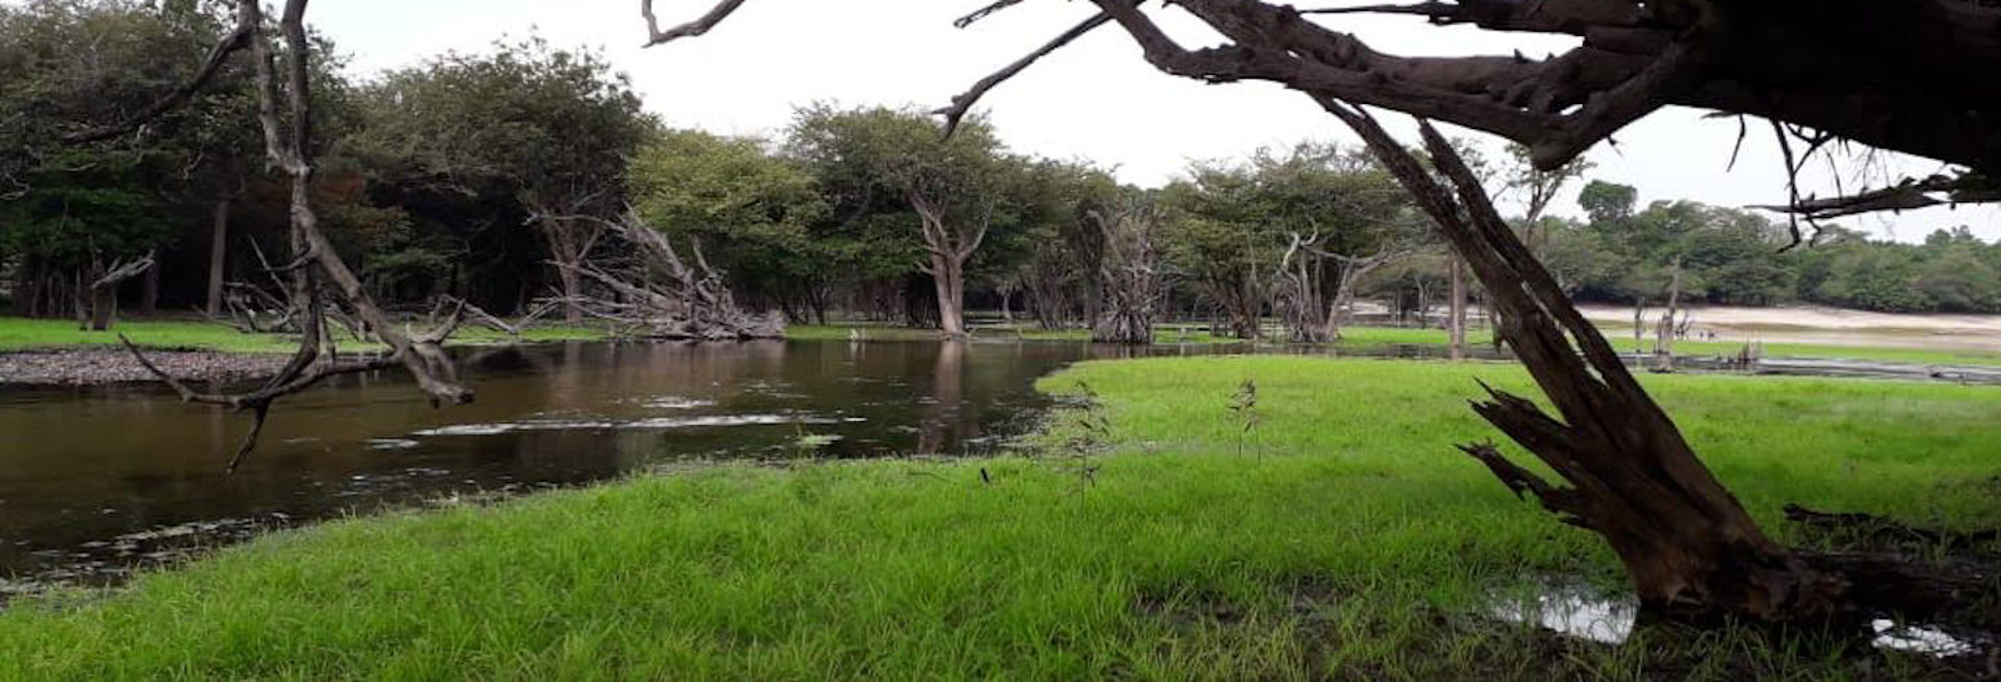 Tour por las comunidades ribereñas del Tapajós